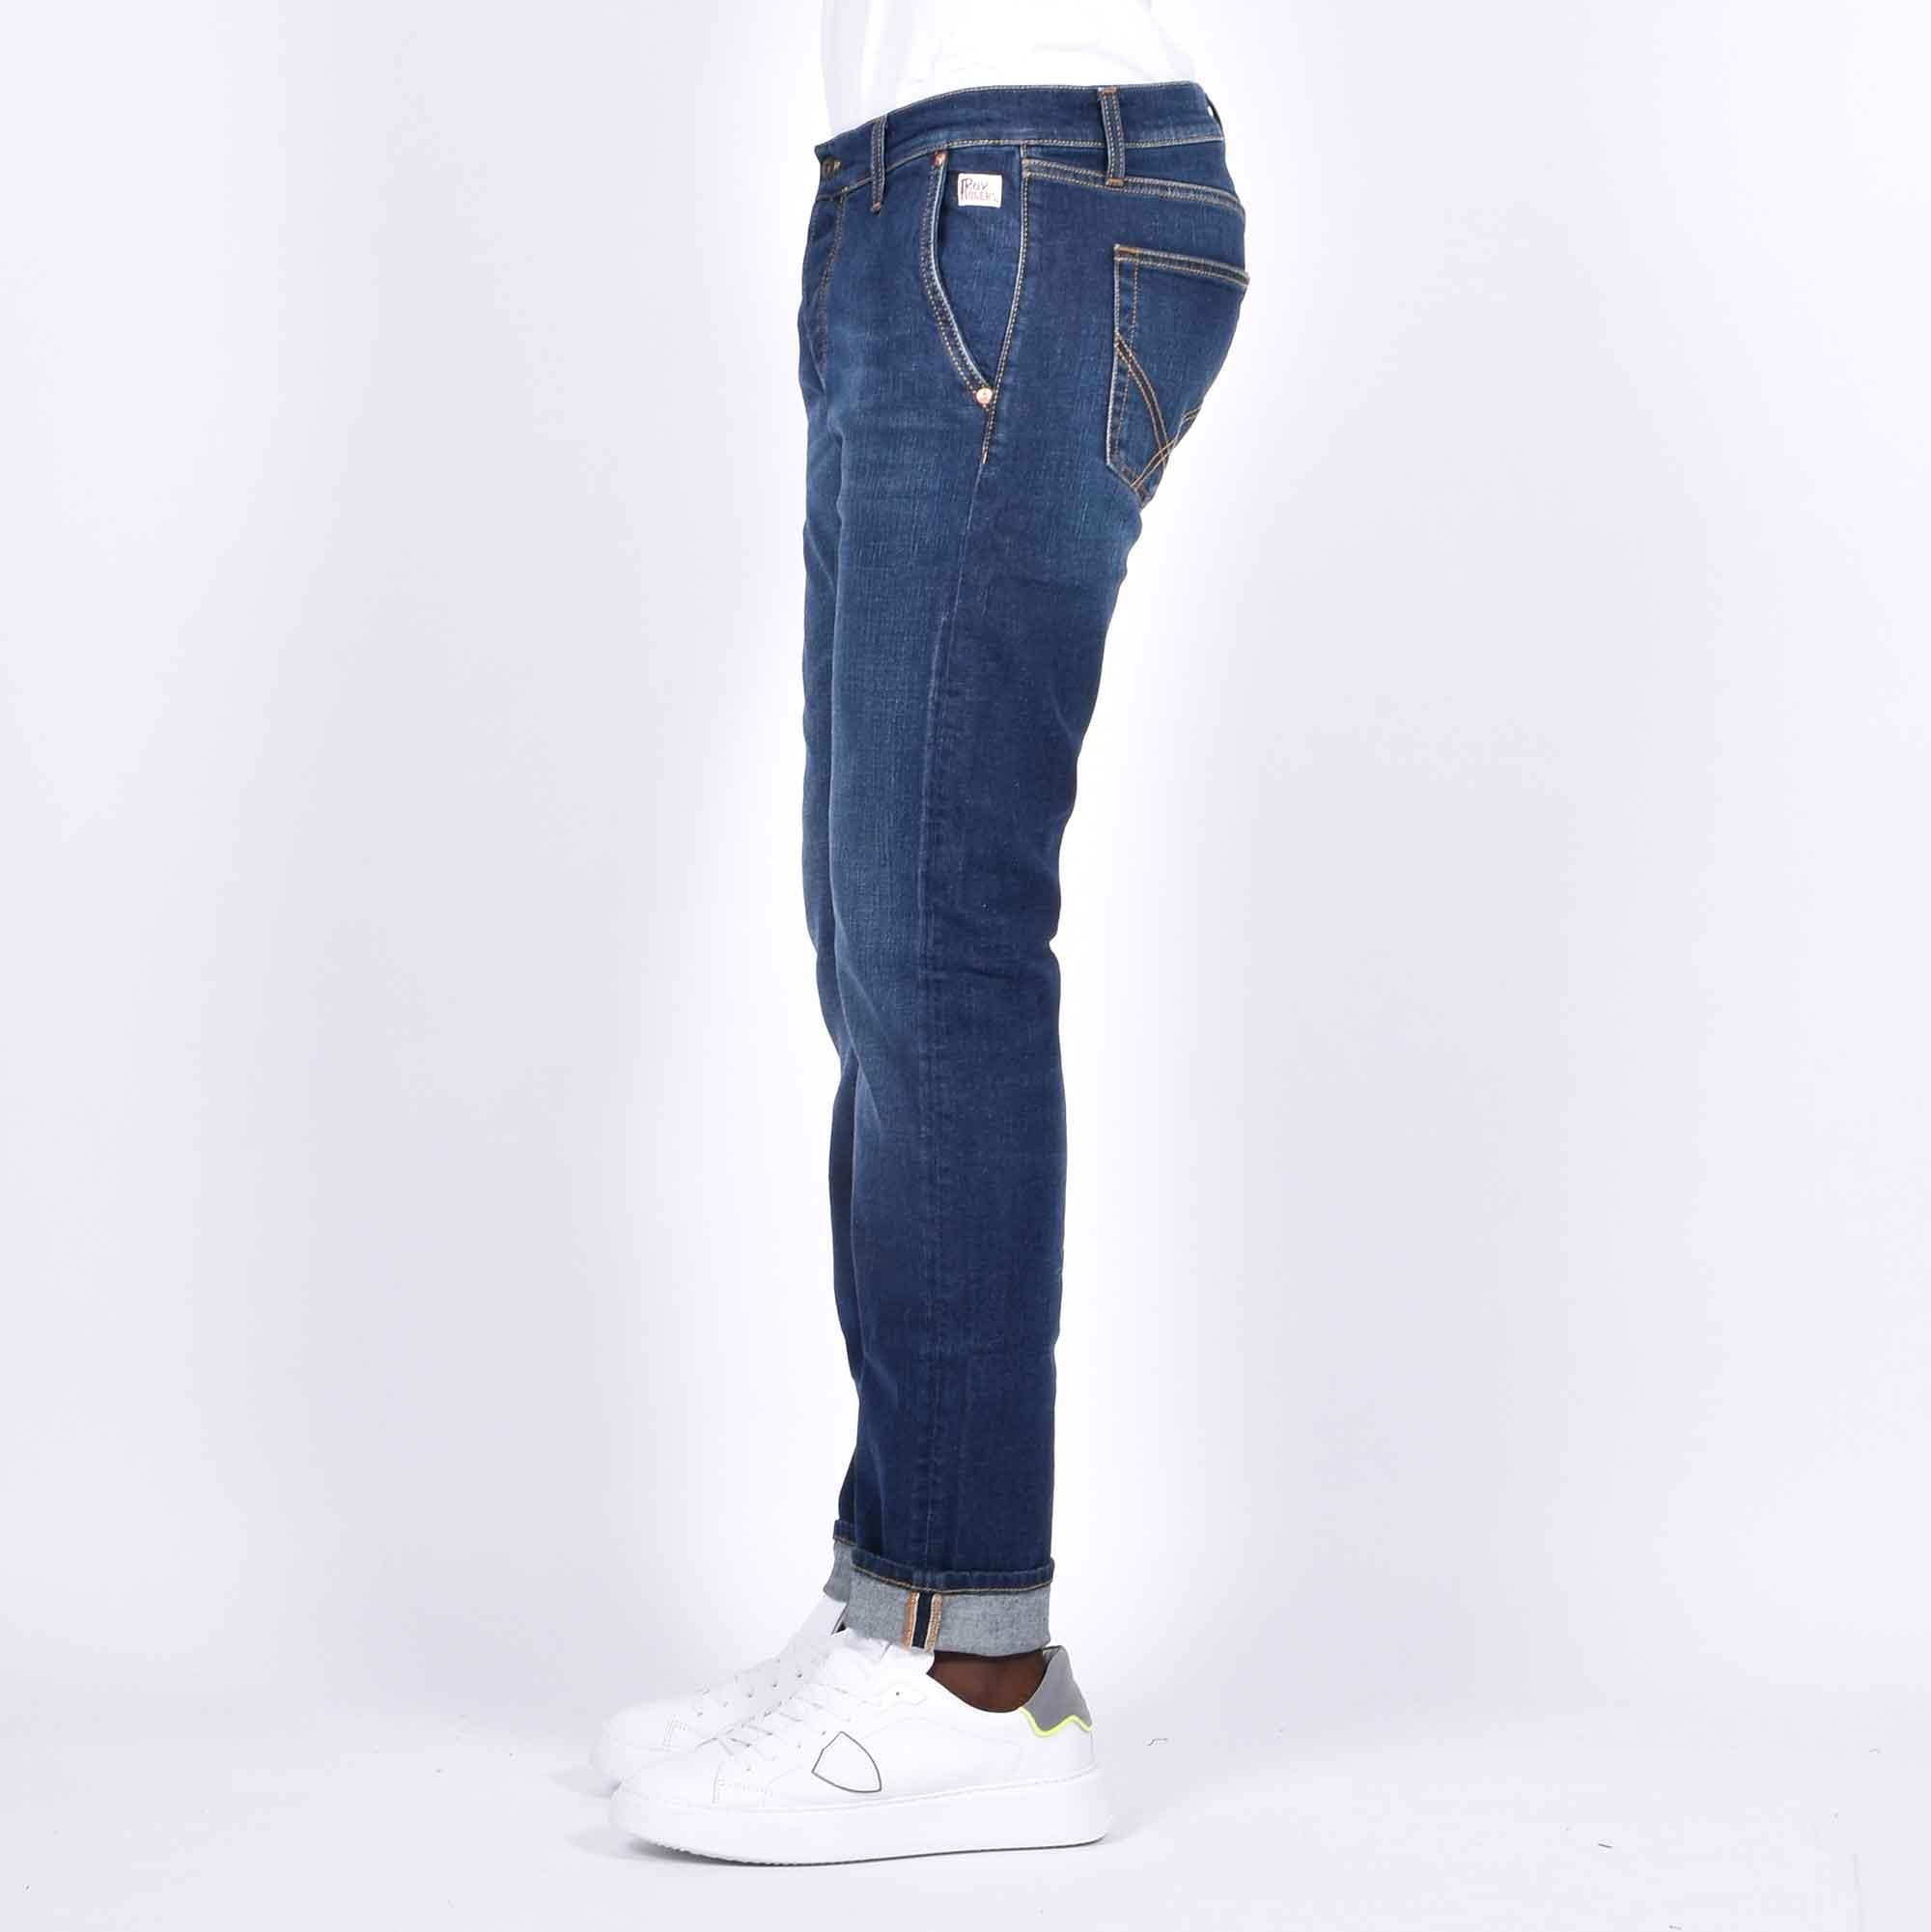 Jeans elias nozeleg- Denim